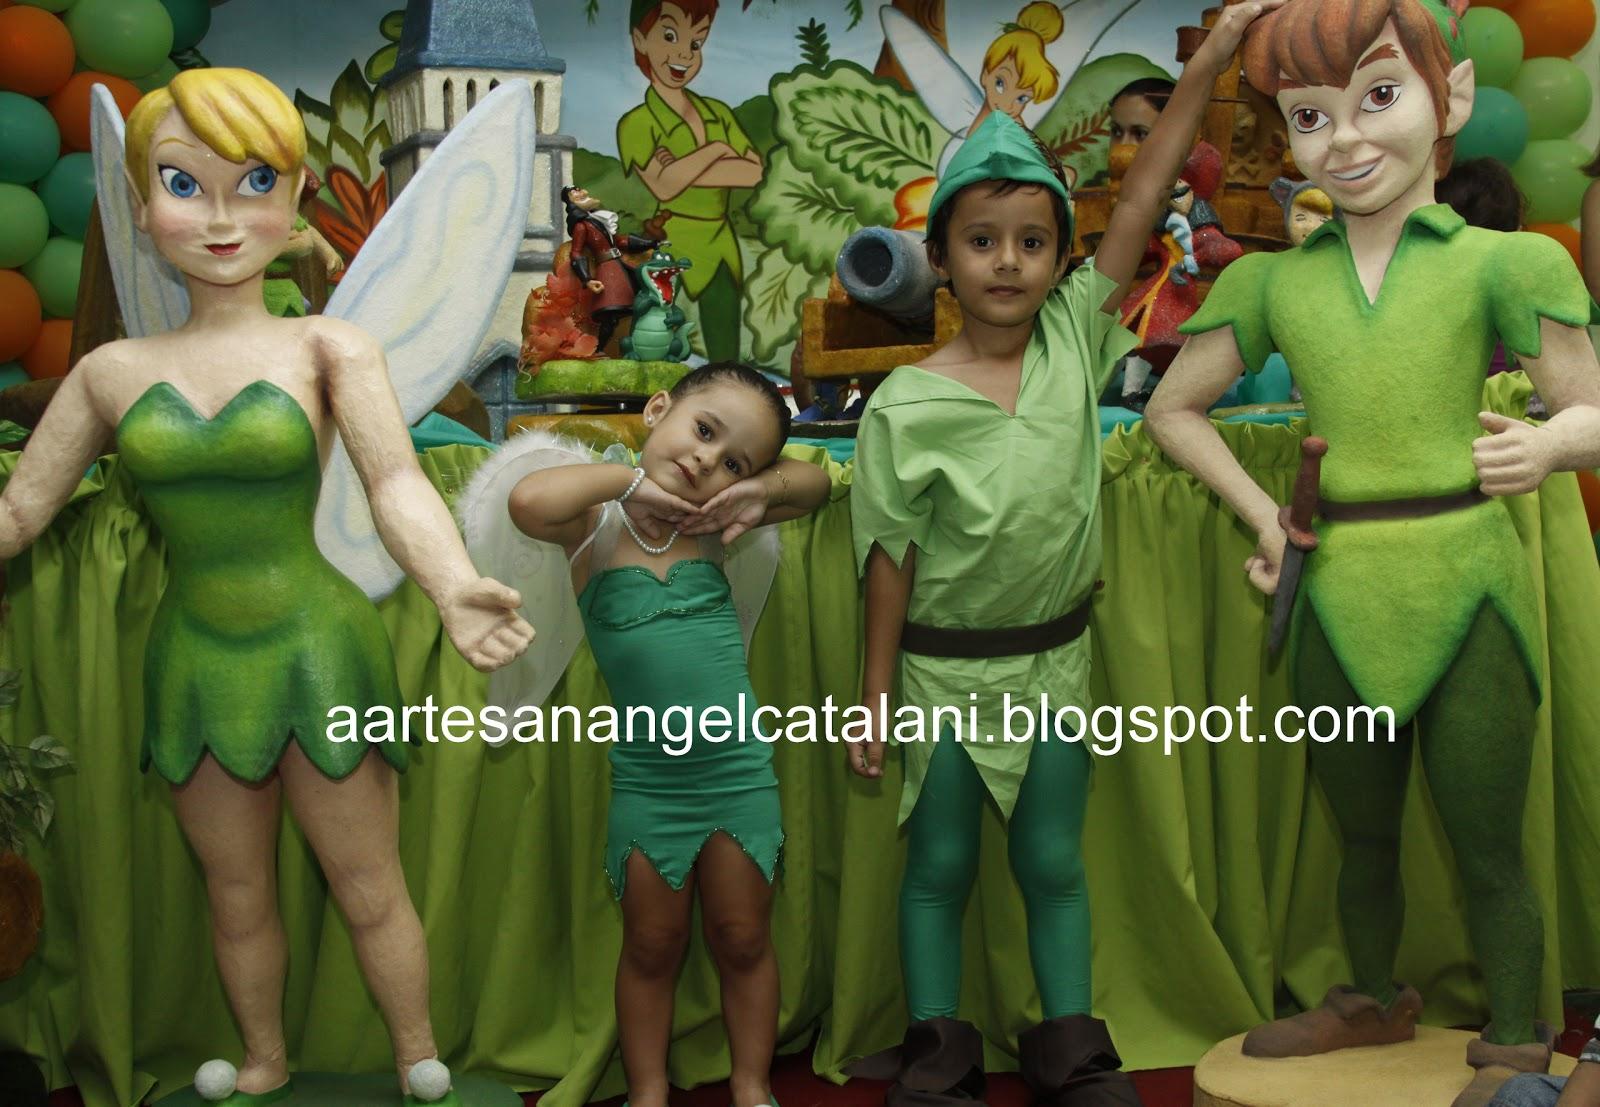 Postado Por Angel Catalani Artesanatos   S 6 14 PM